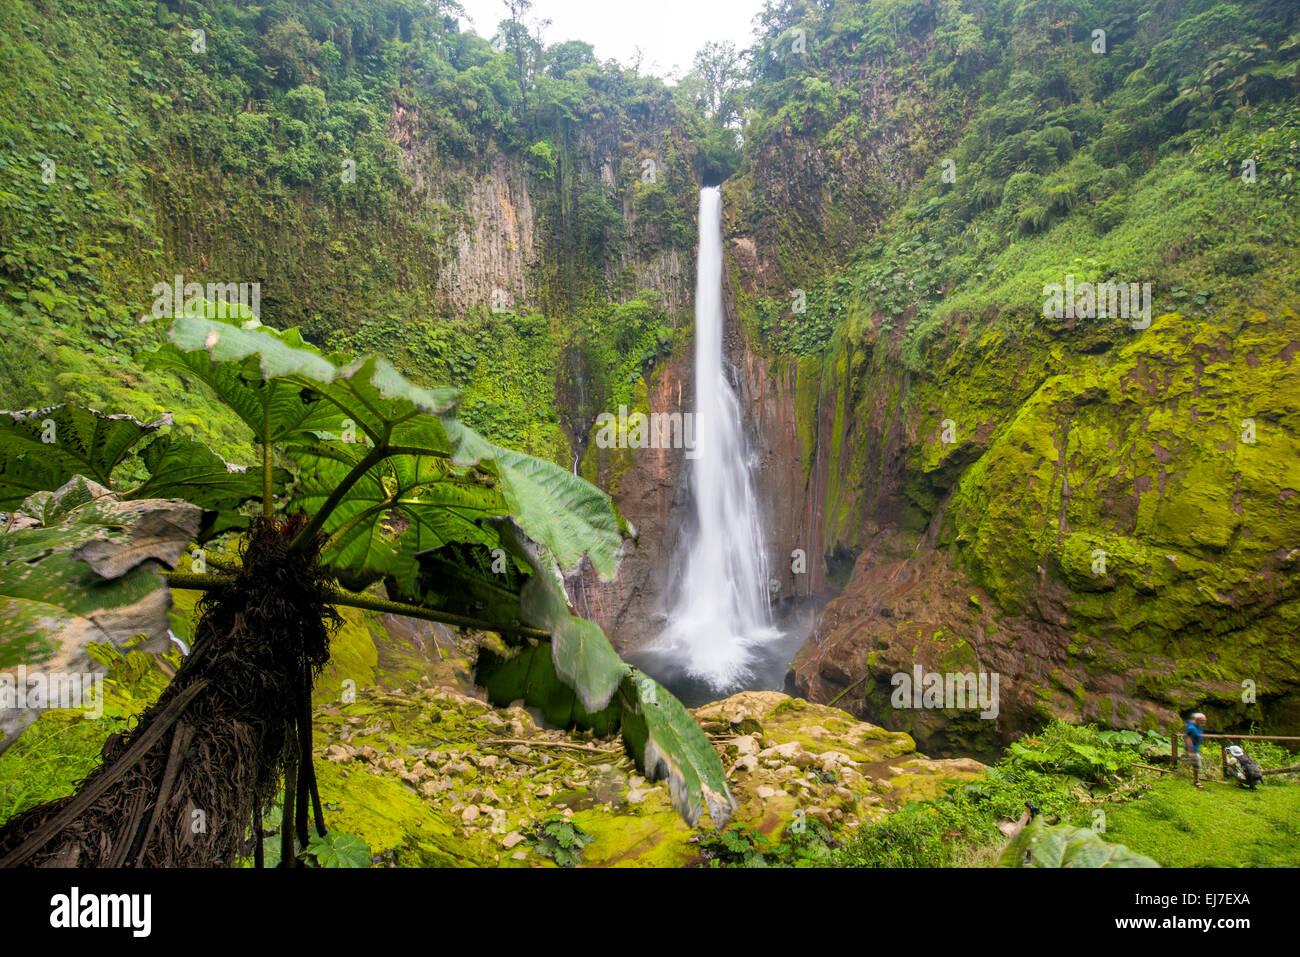 Costa Rica Toro Rio Cuarto de Grecia Costa Rica Nebelwald, Regenwald ...